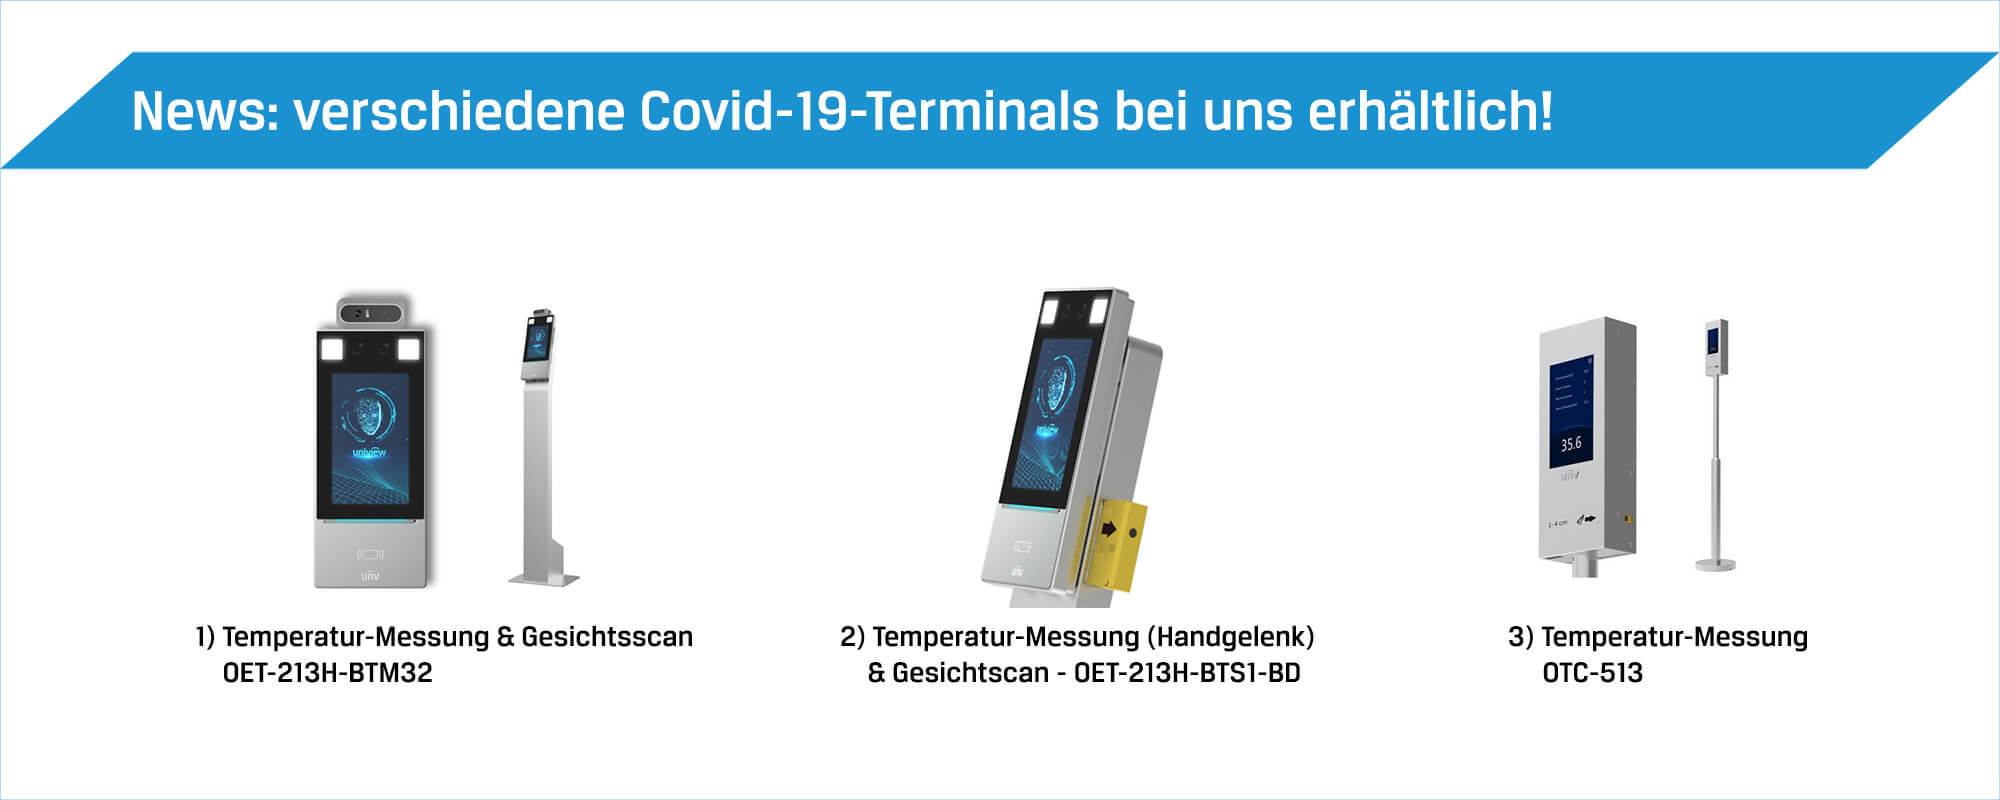 Zutrittskontrolle Covid-19 Terminals und Corona-Spezialartikel